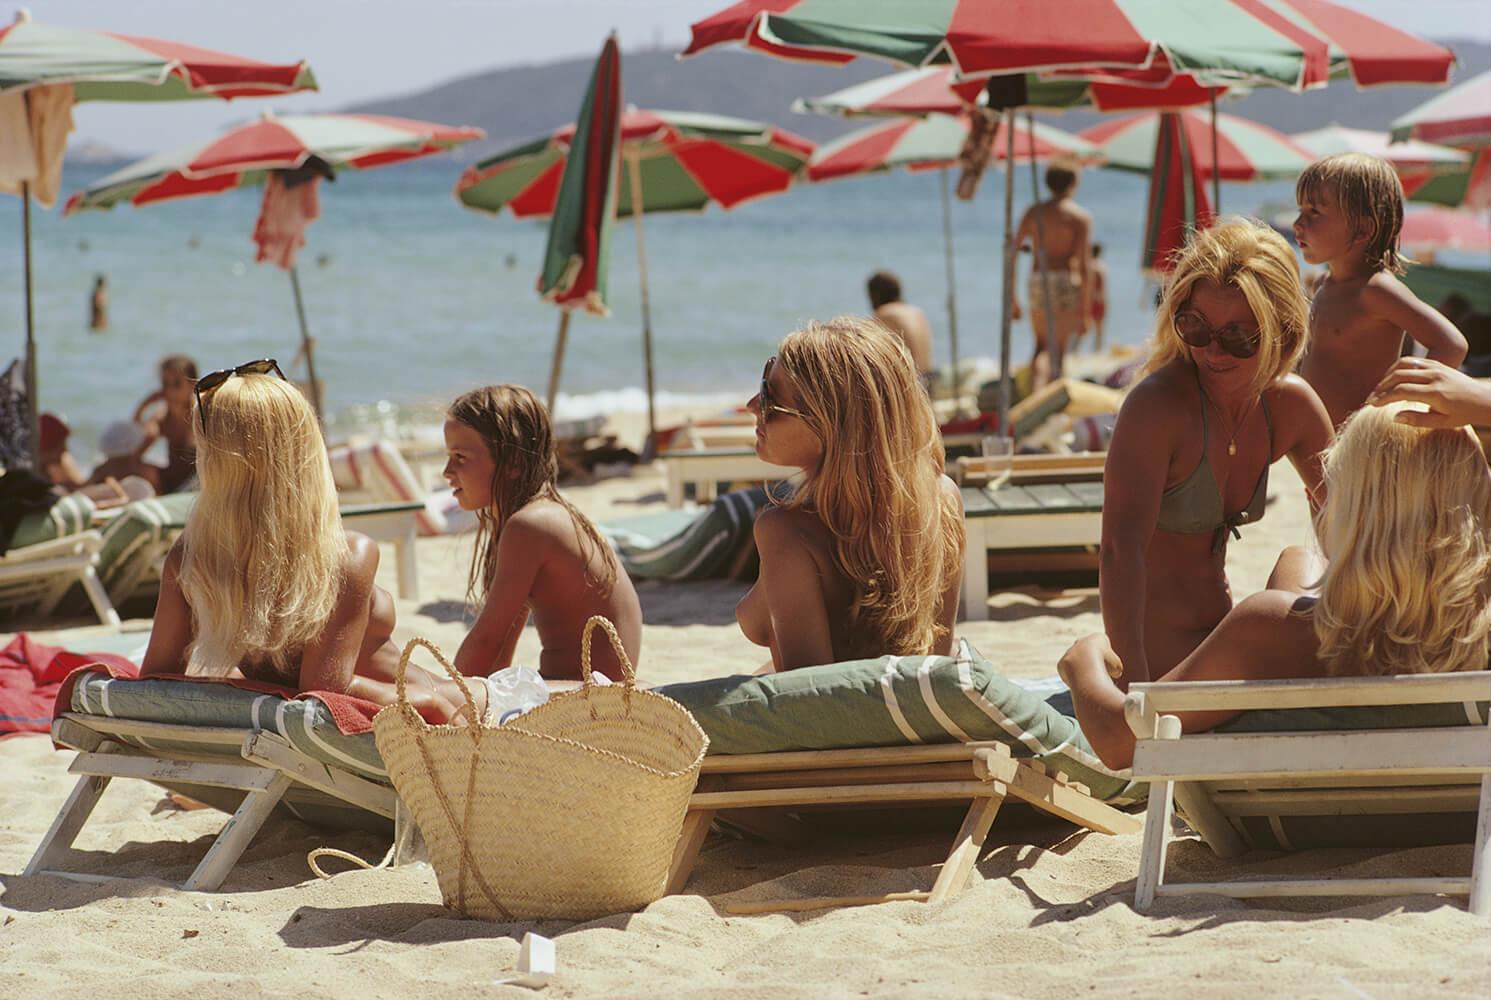 Saint-Tropez Beach fine art photography